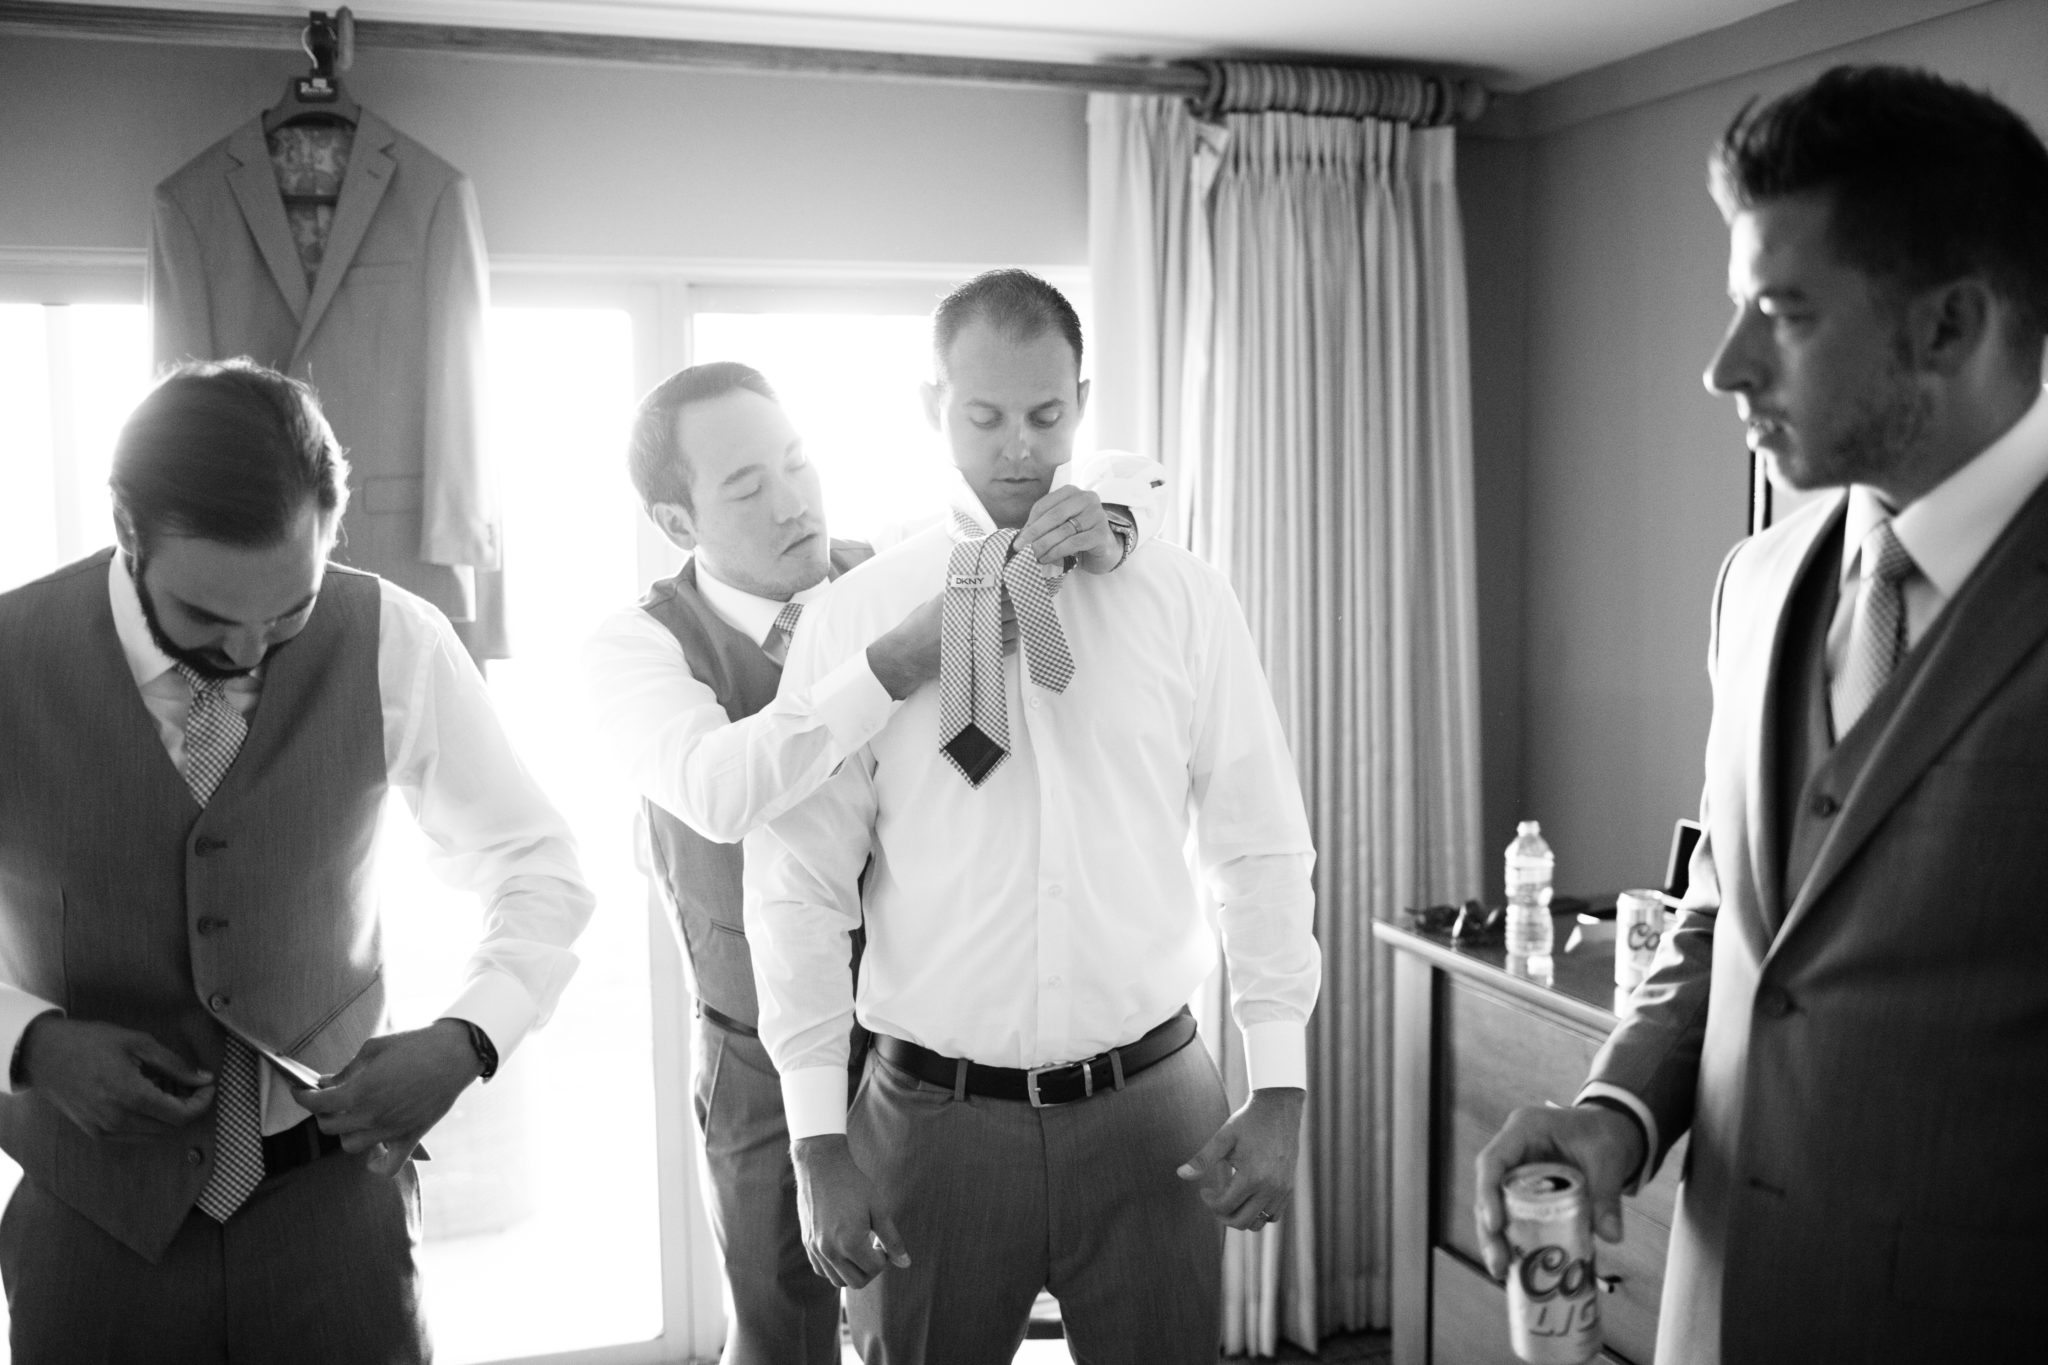 Temecula_Creek_Inn_Wedding_019.jpg